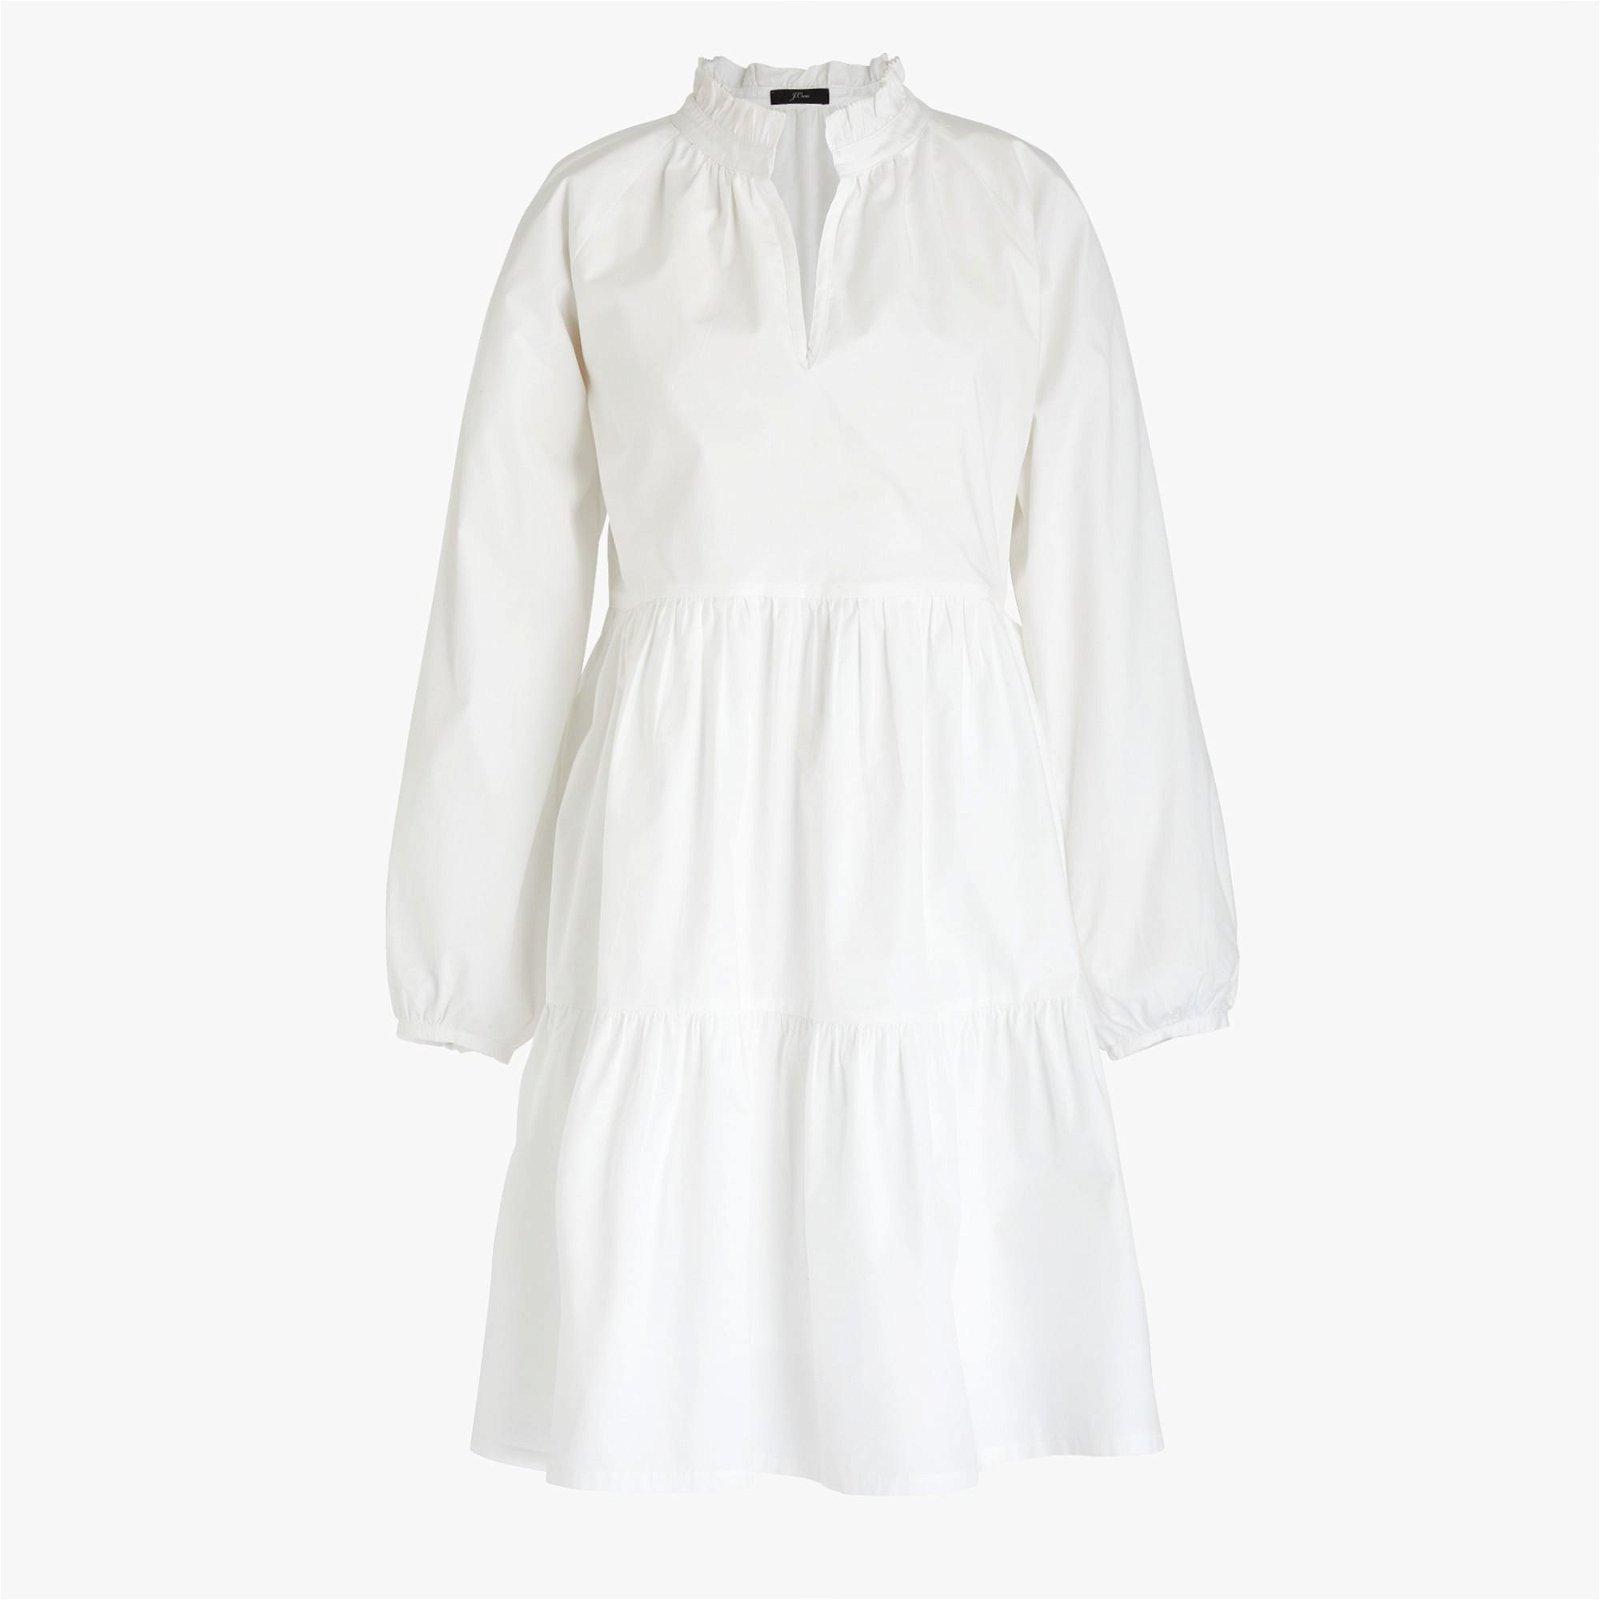 Classic Tiered popover dress in cotton poplin